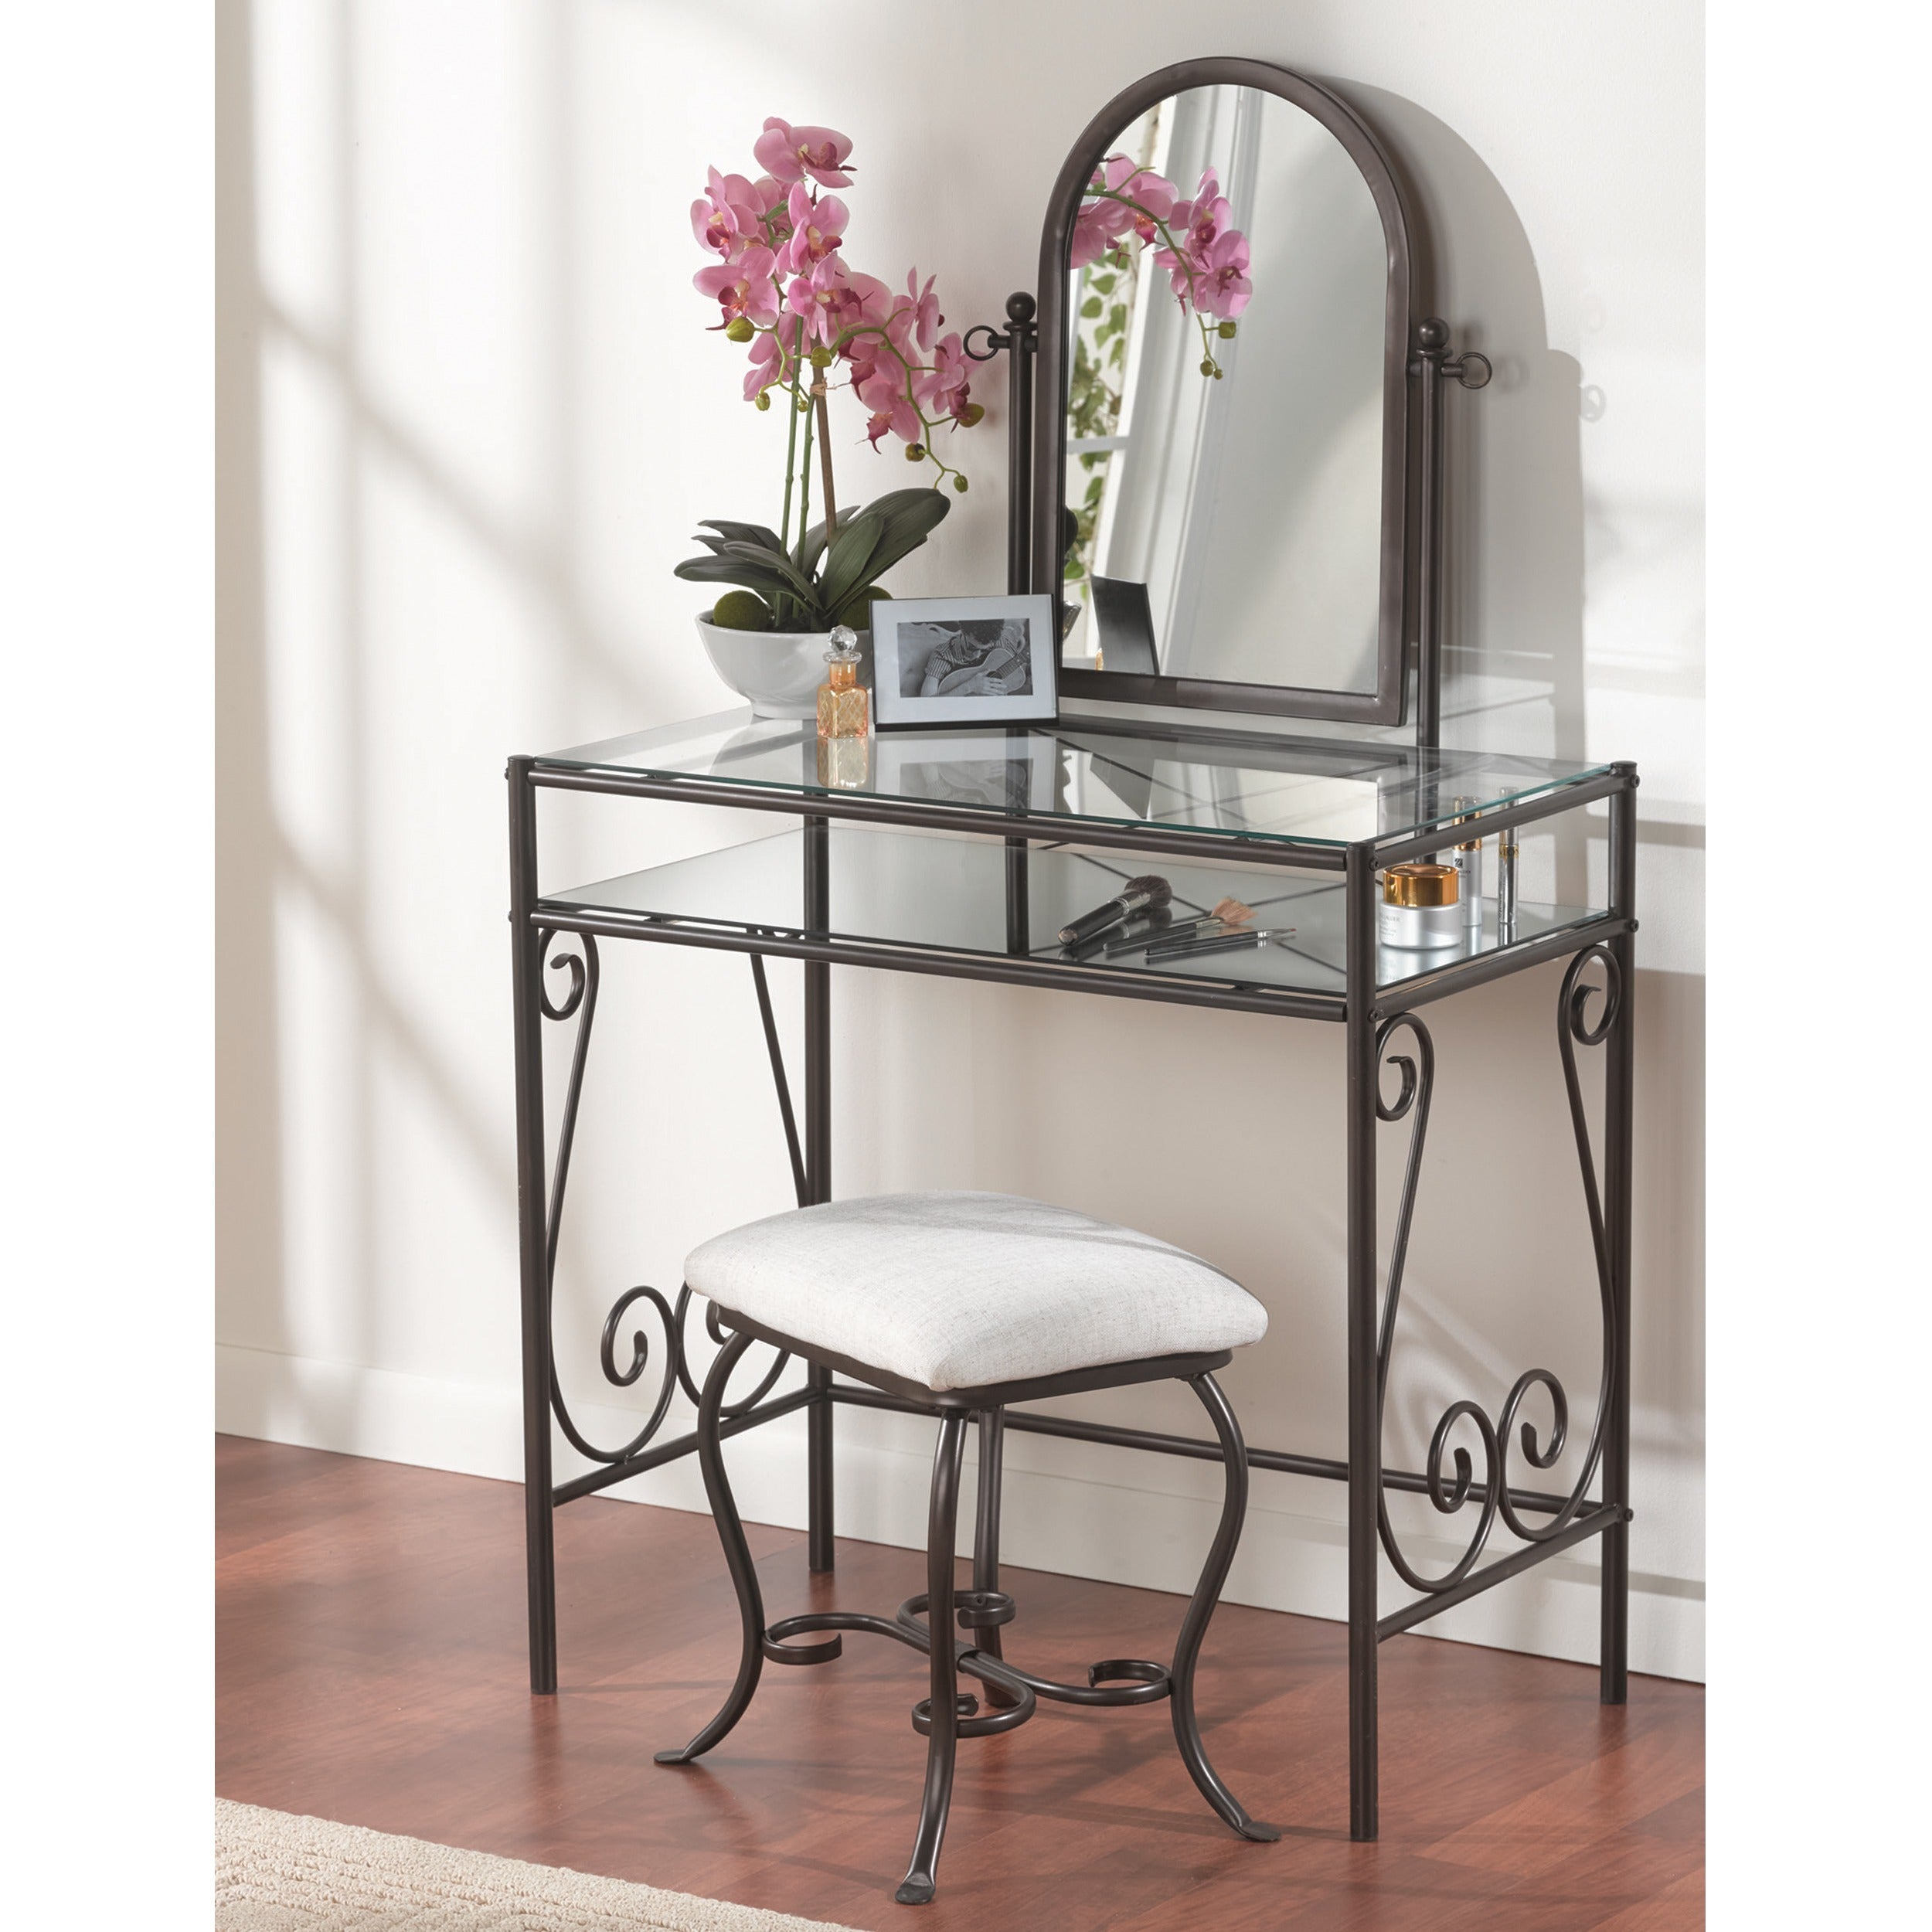 Linon Angelica Glass Top Metal (Grey) Vanity Table, Stool...